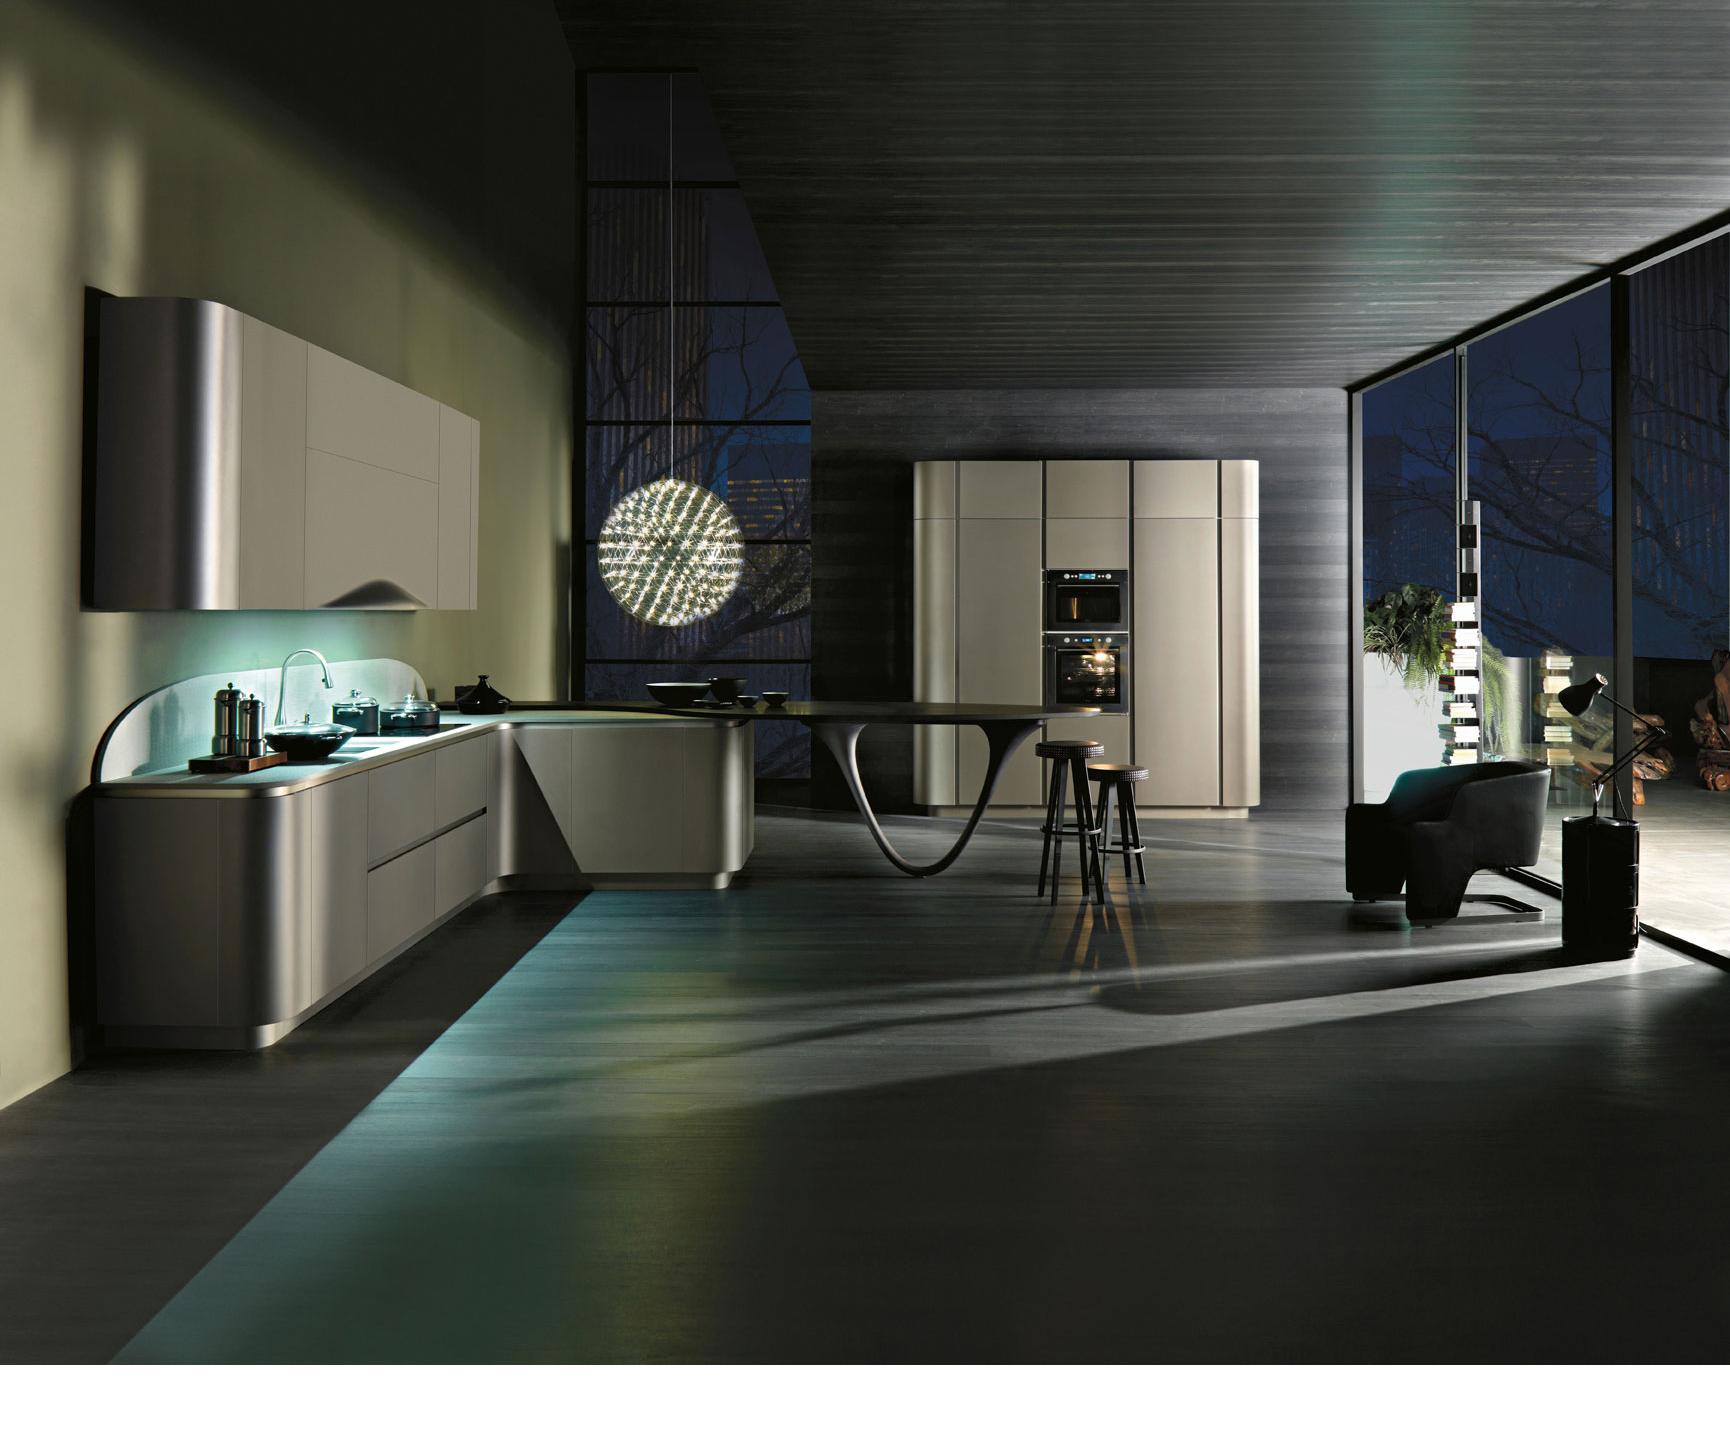 jm cuisines depuis 1975 vente installation cuisine 91400 92220. Black Bedroom Furniture Sets. Home Design Ideas